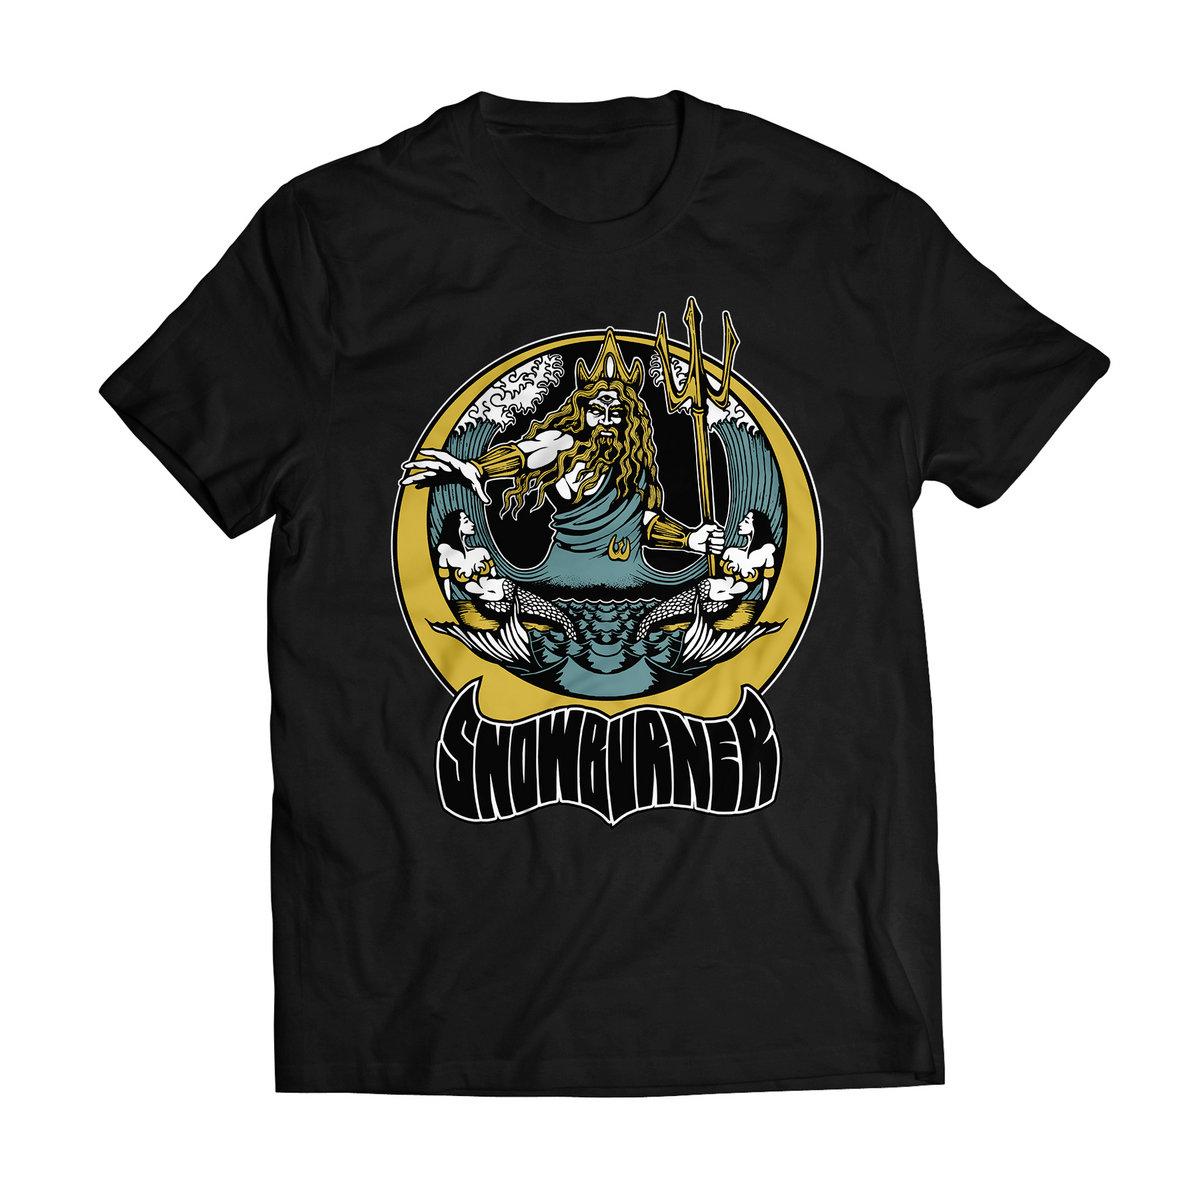 Poseidon Design T Shirt Black Snowburner